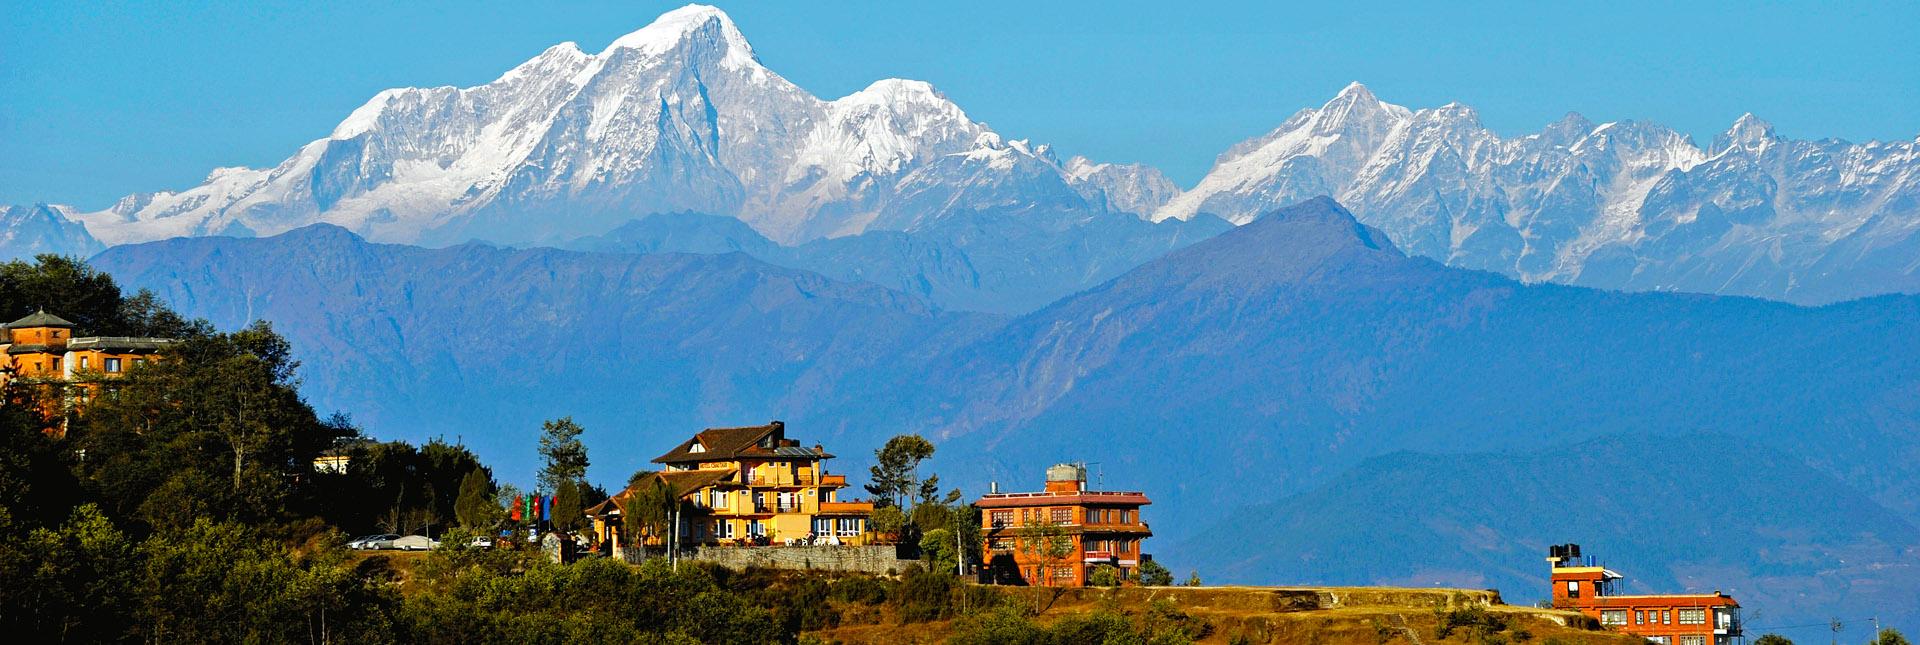 Kathmandu, view on a clear day